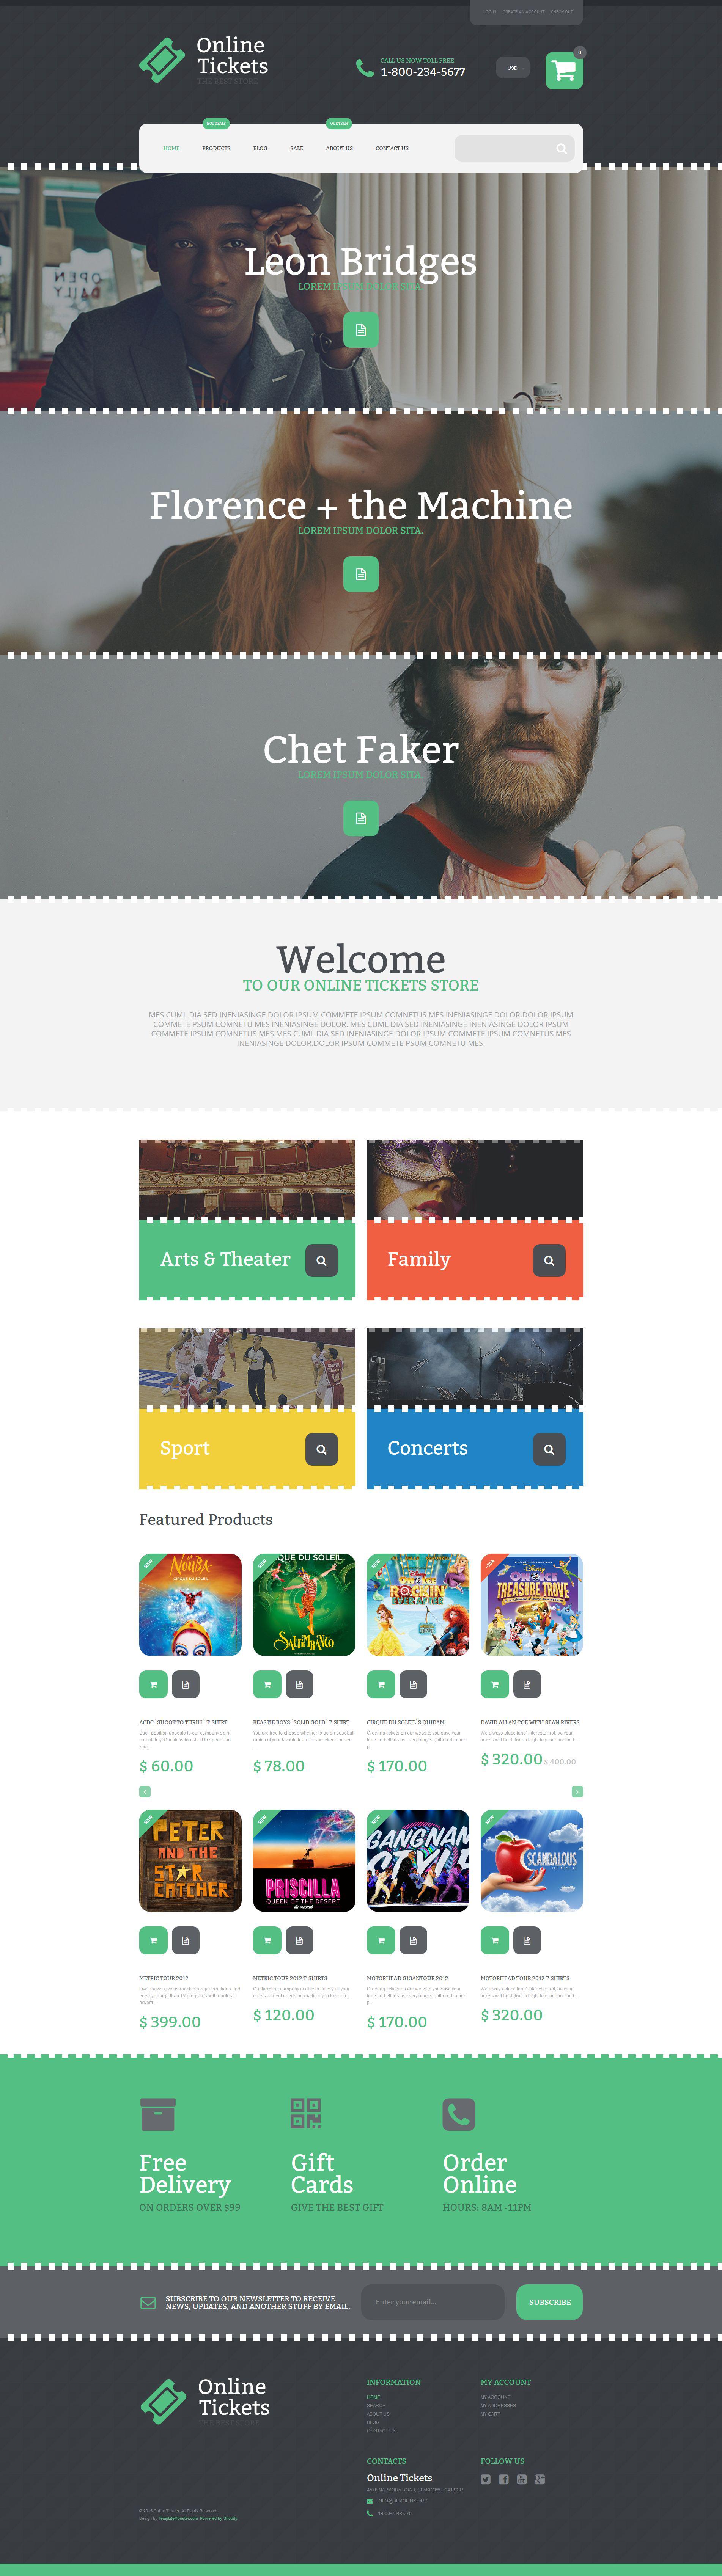 """Online Tickets"" - адаптивний Shopify шаблон №55234"